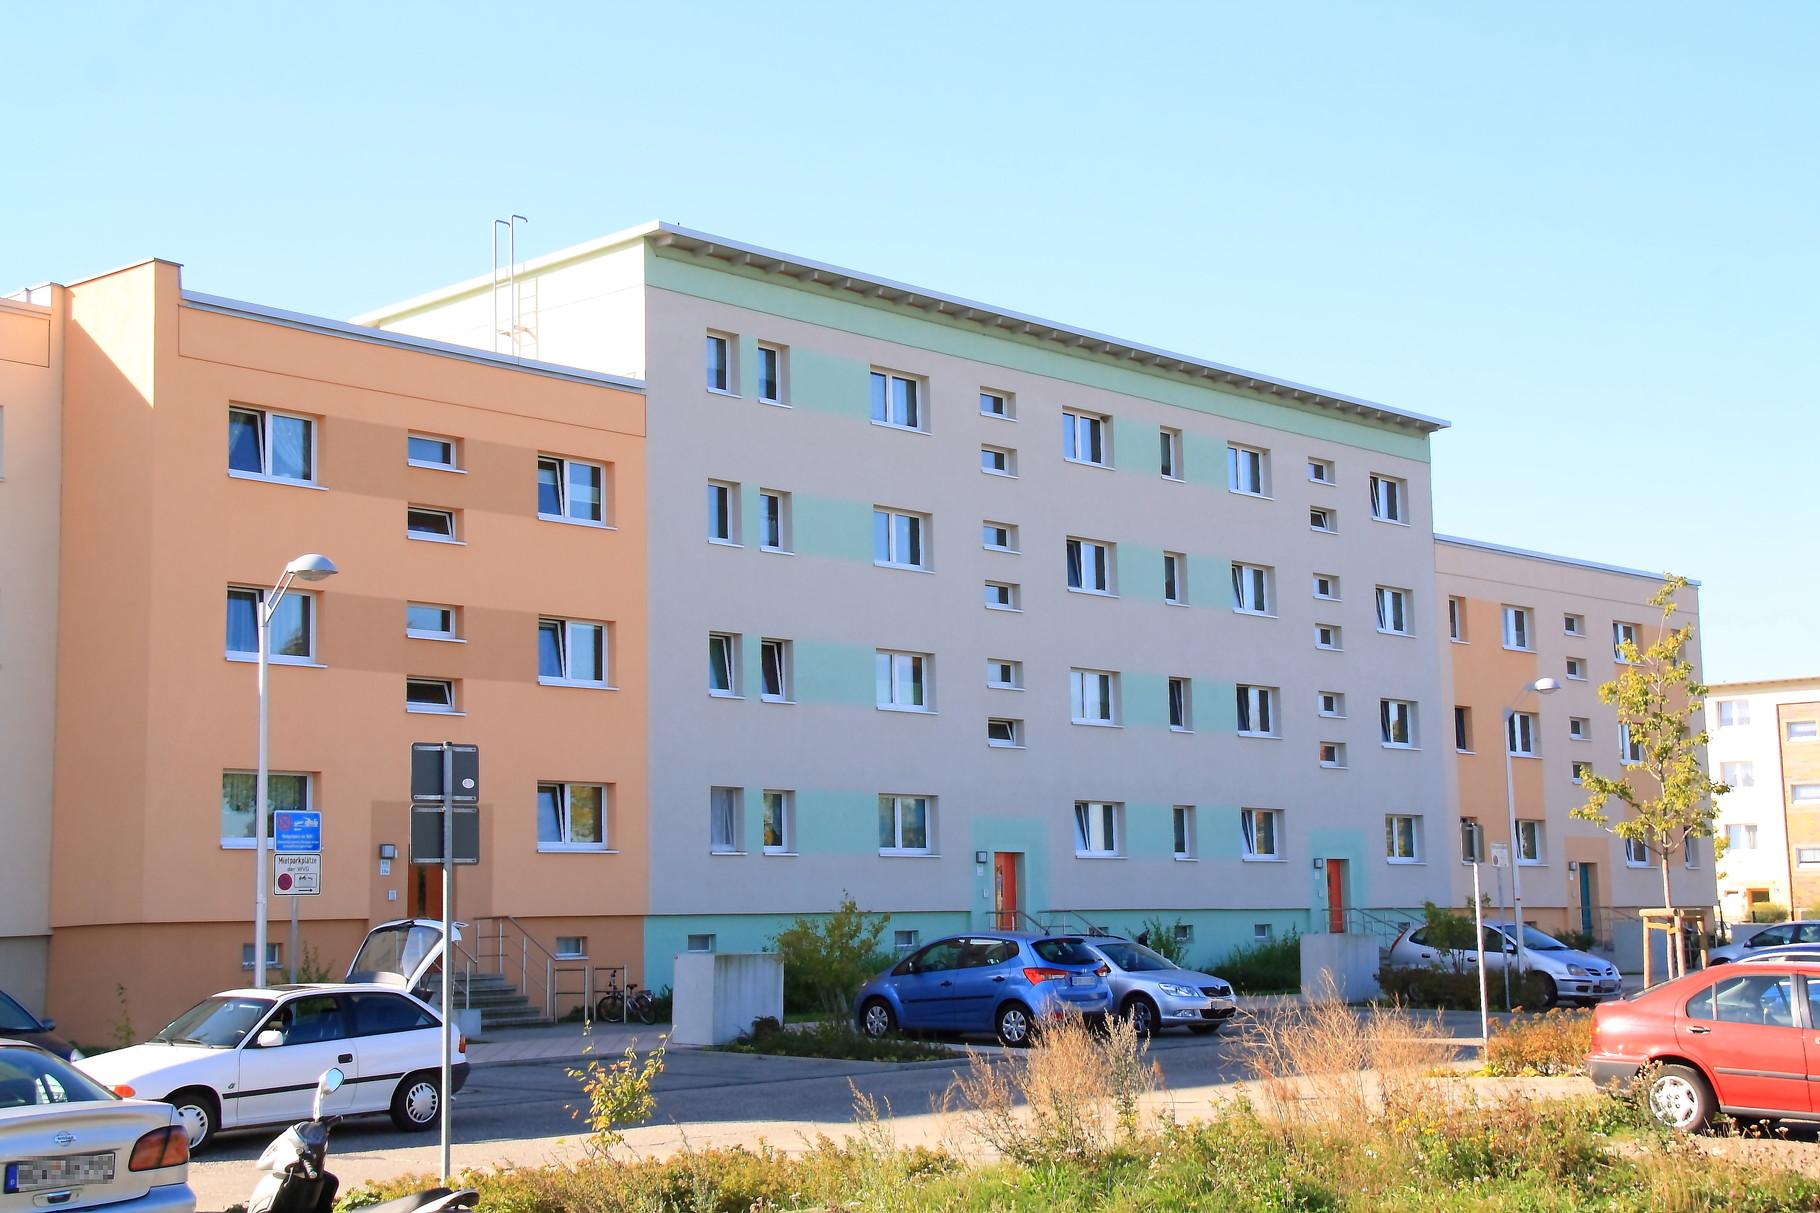 Greifswald, Wohngebäude Helsinkiring 18-19